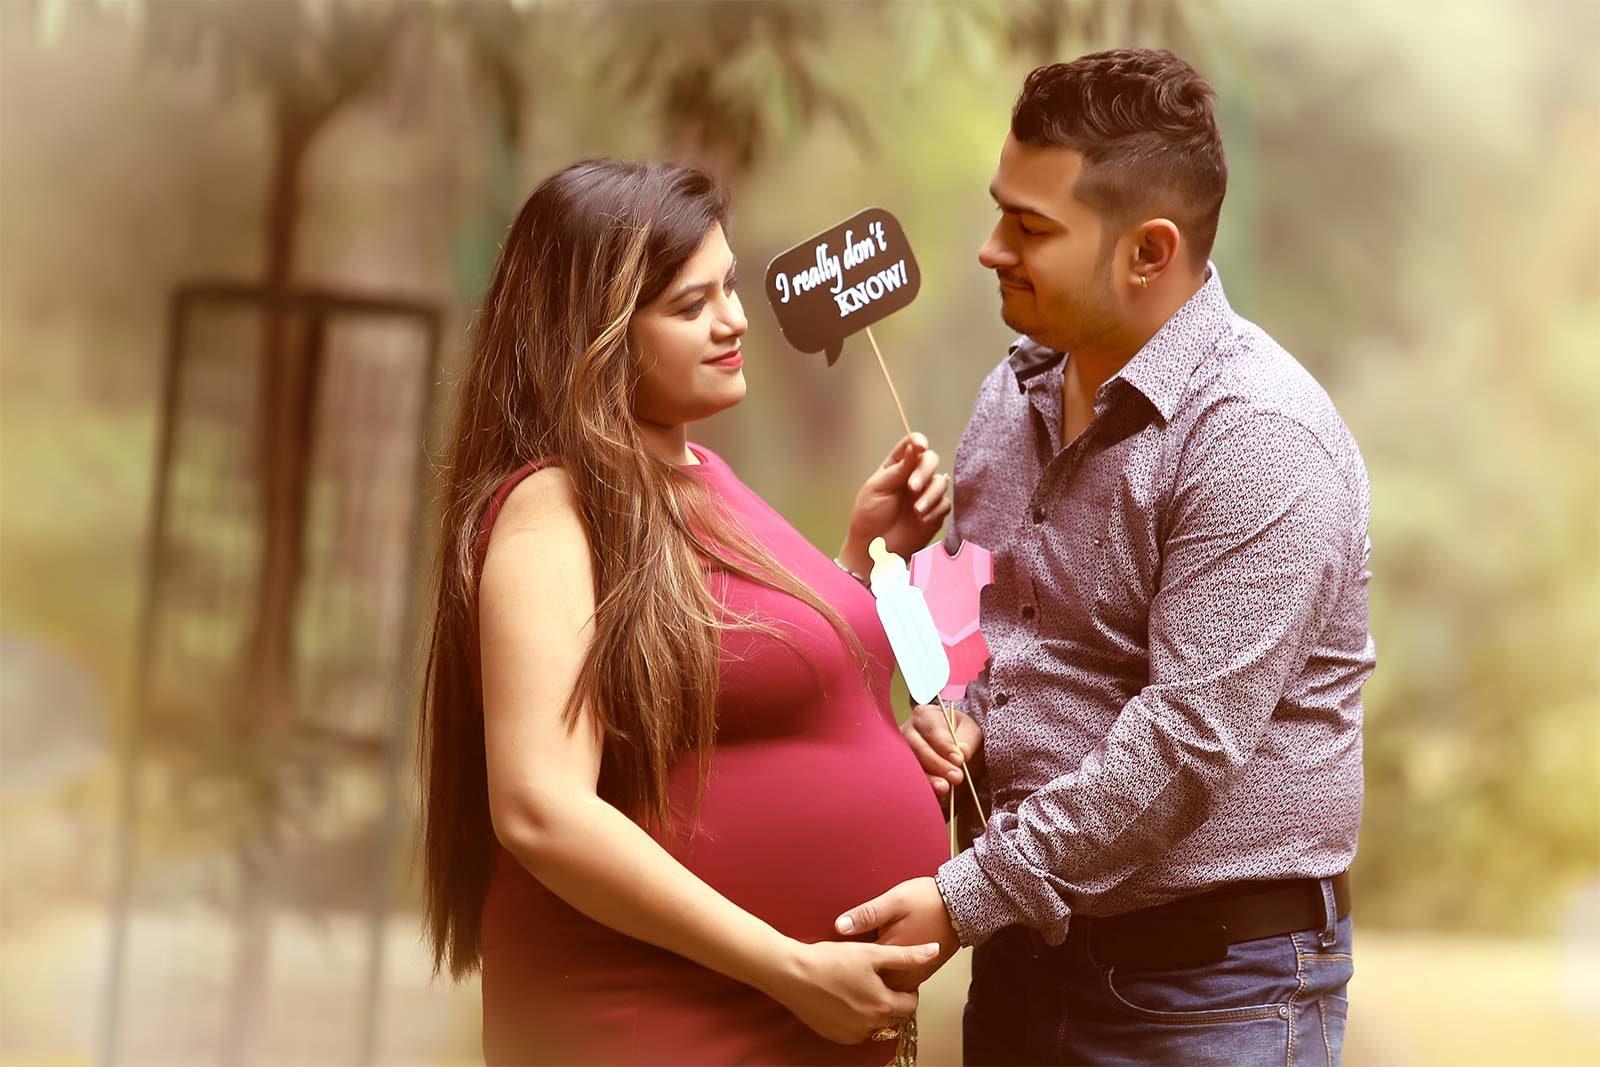 Maternity Pregnancy Photo Shoot Ideas For Couples Archives Sandeep Shokeen